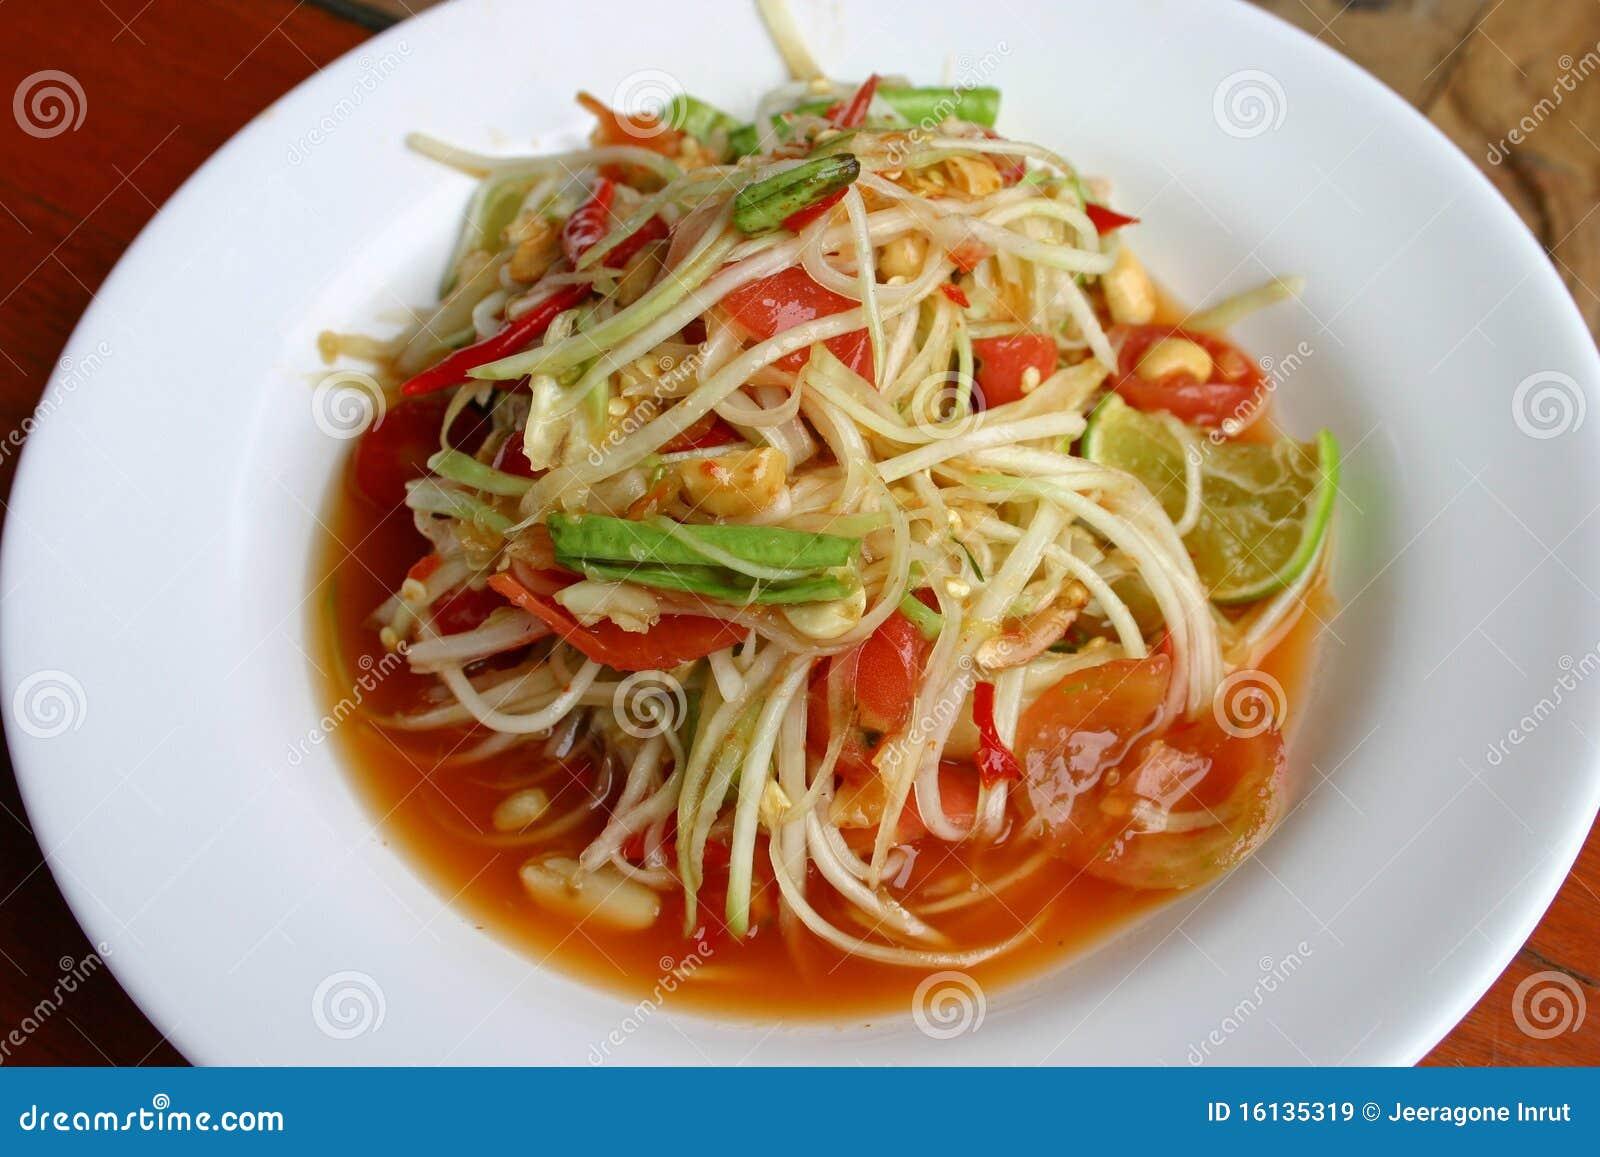 hot and spicy papaya salad stock image image of sauce